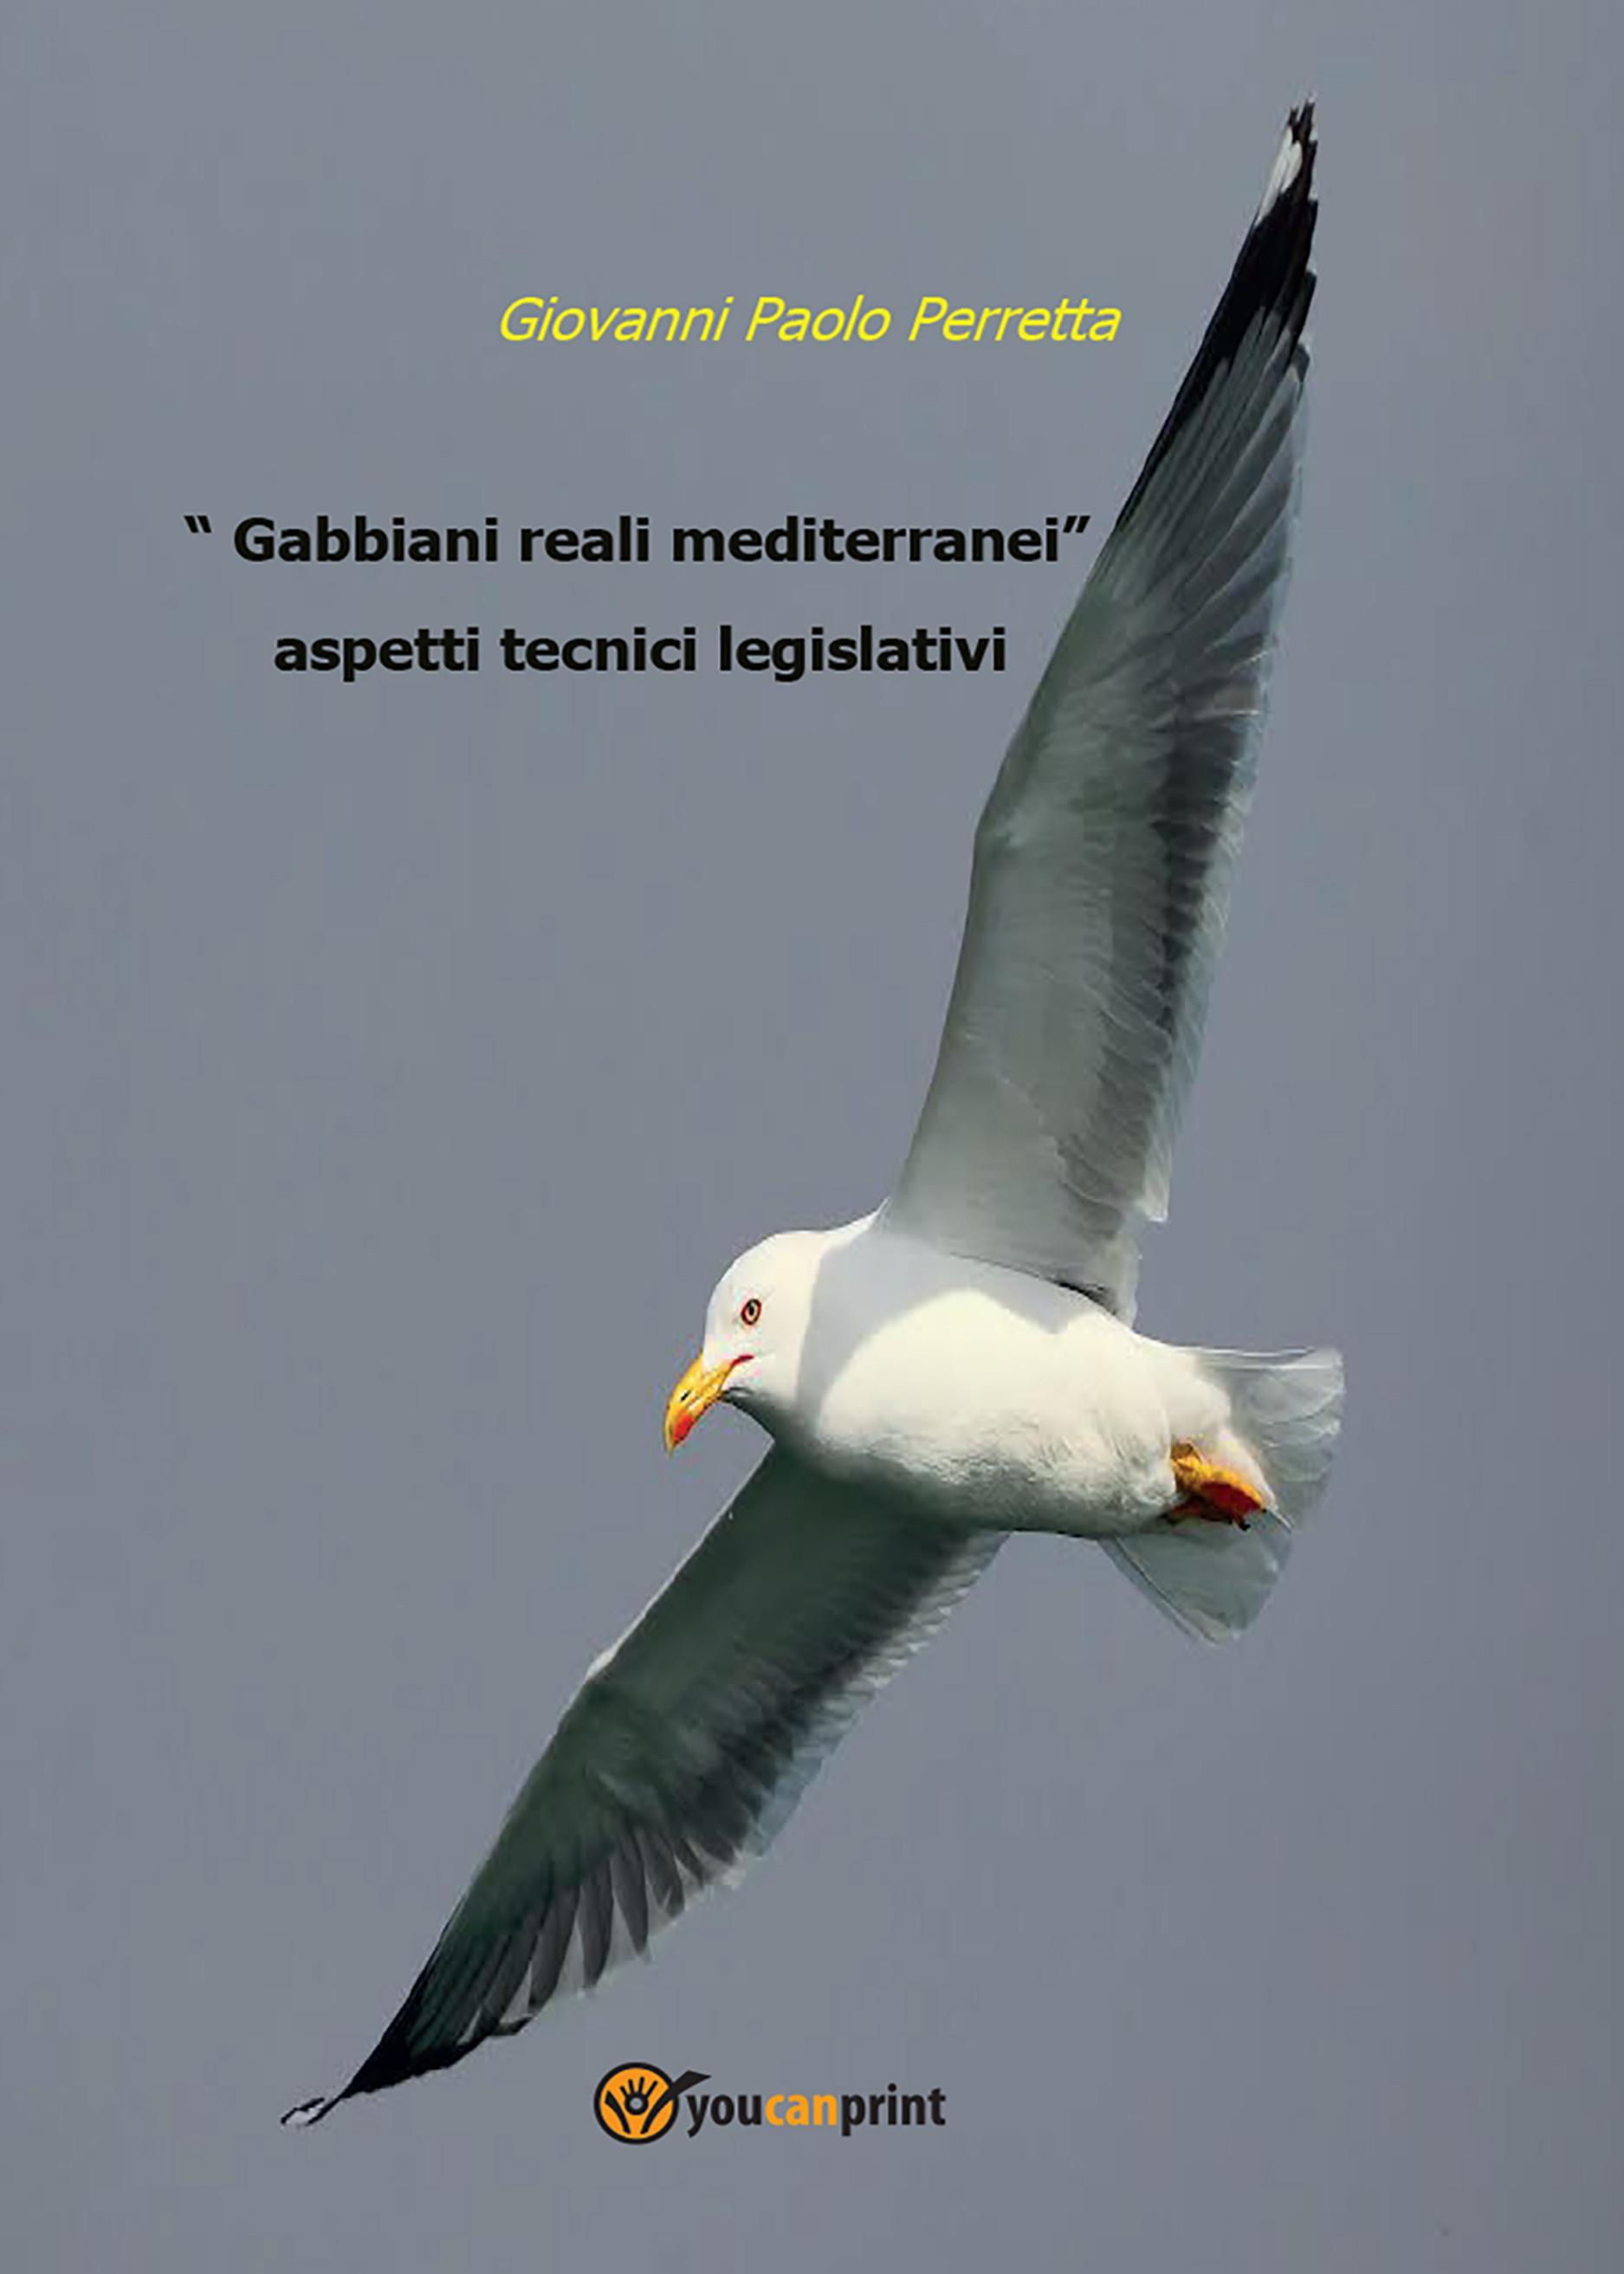 Gabbiani reali mediterranei aspetti tecnici legislativi. Golfo di Gaeta